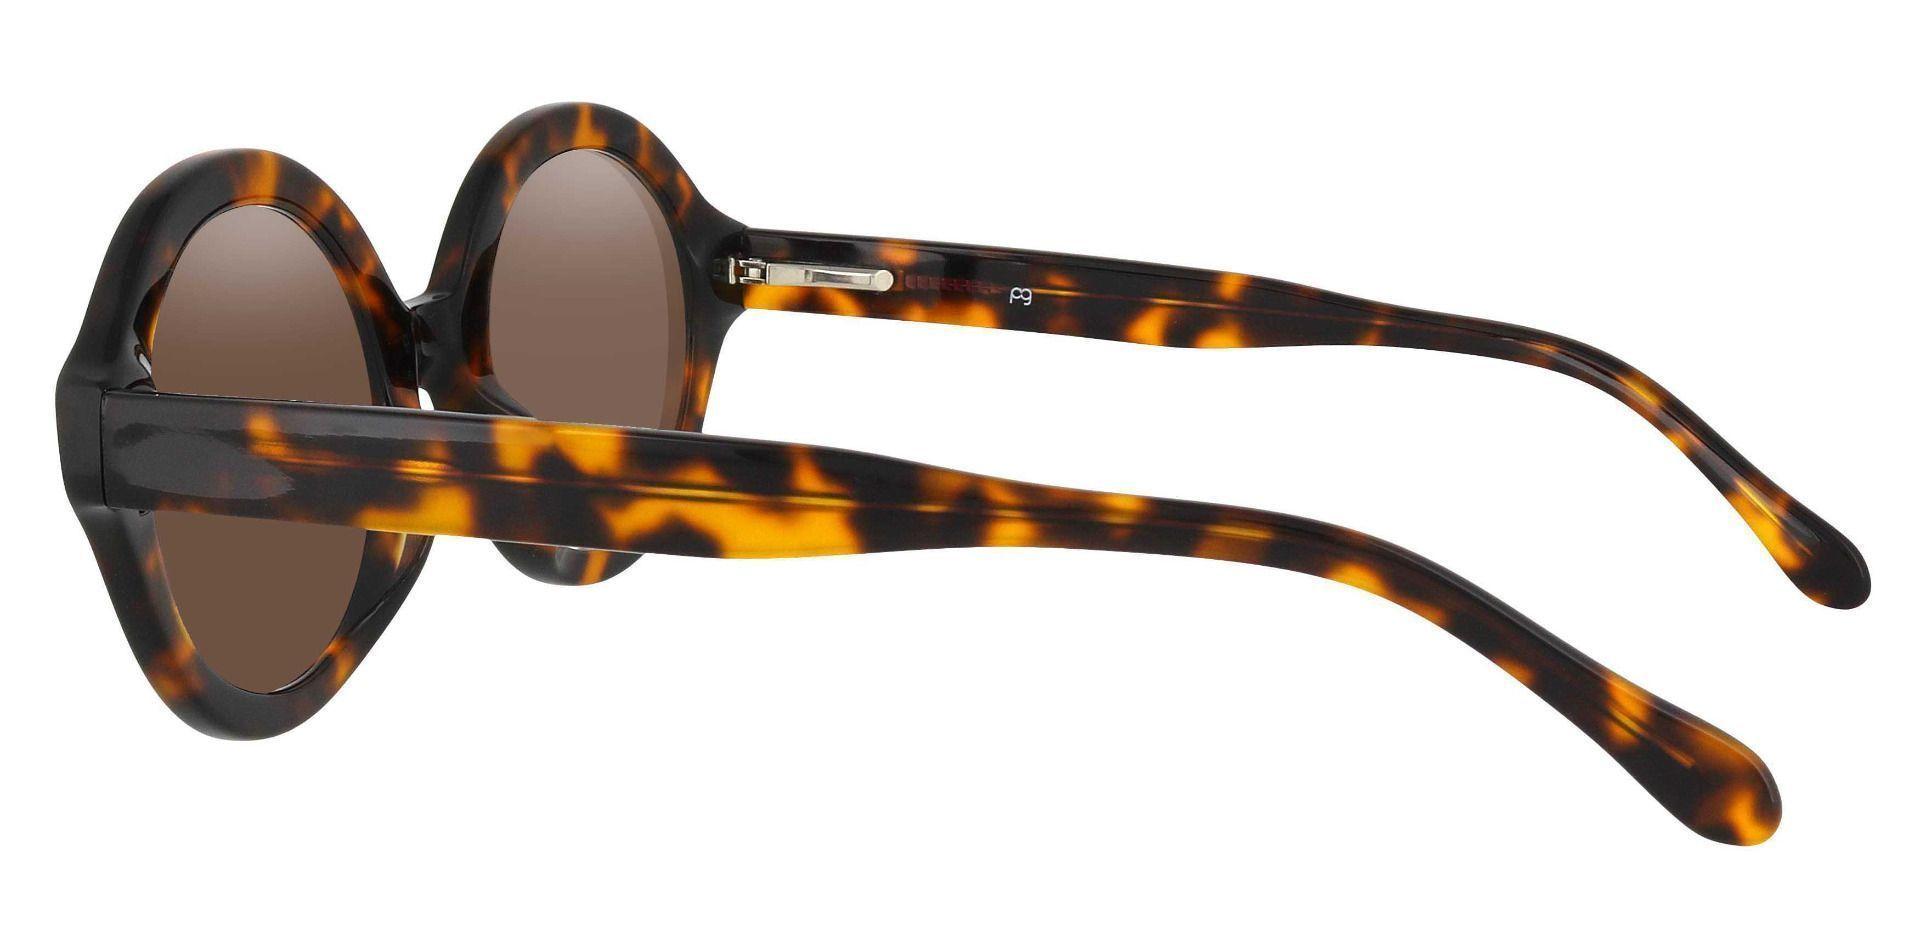 Clara Round Prescription Sunglasses - Tortoise Frame With Brown Lenses